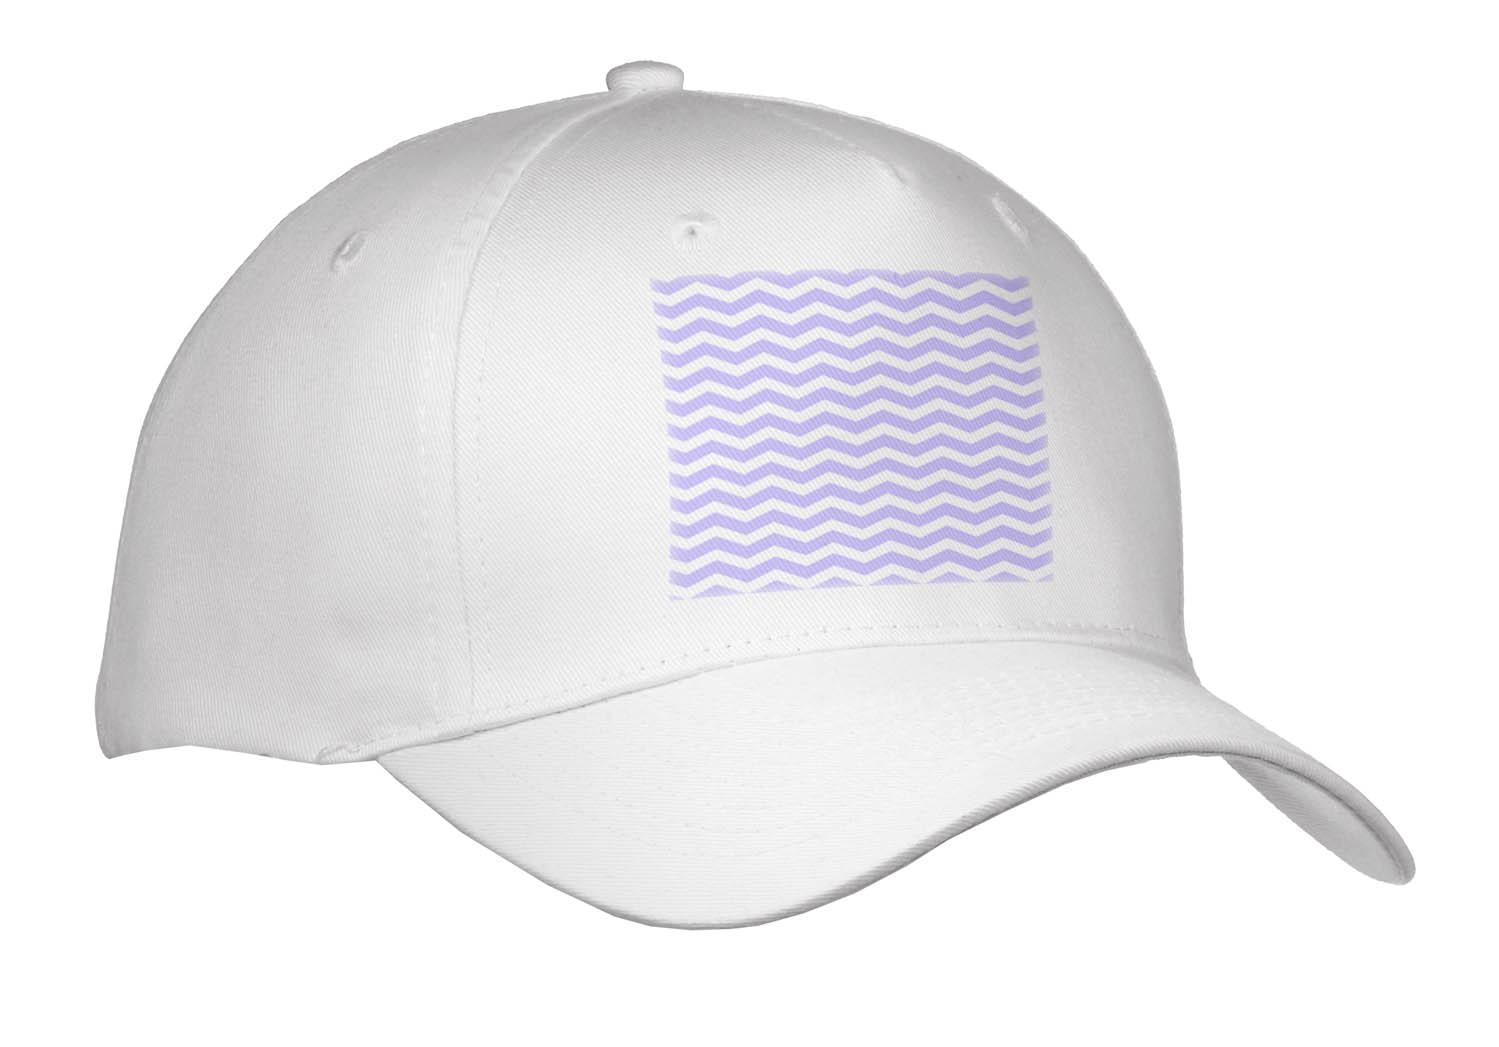 3dRose - InspirationzStore Chevron Patterns - Lilac Purple and White Chevron Zig Zag Striped Pattern Feminine and Fun - Caps at Sears.com